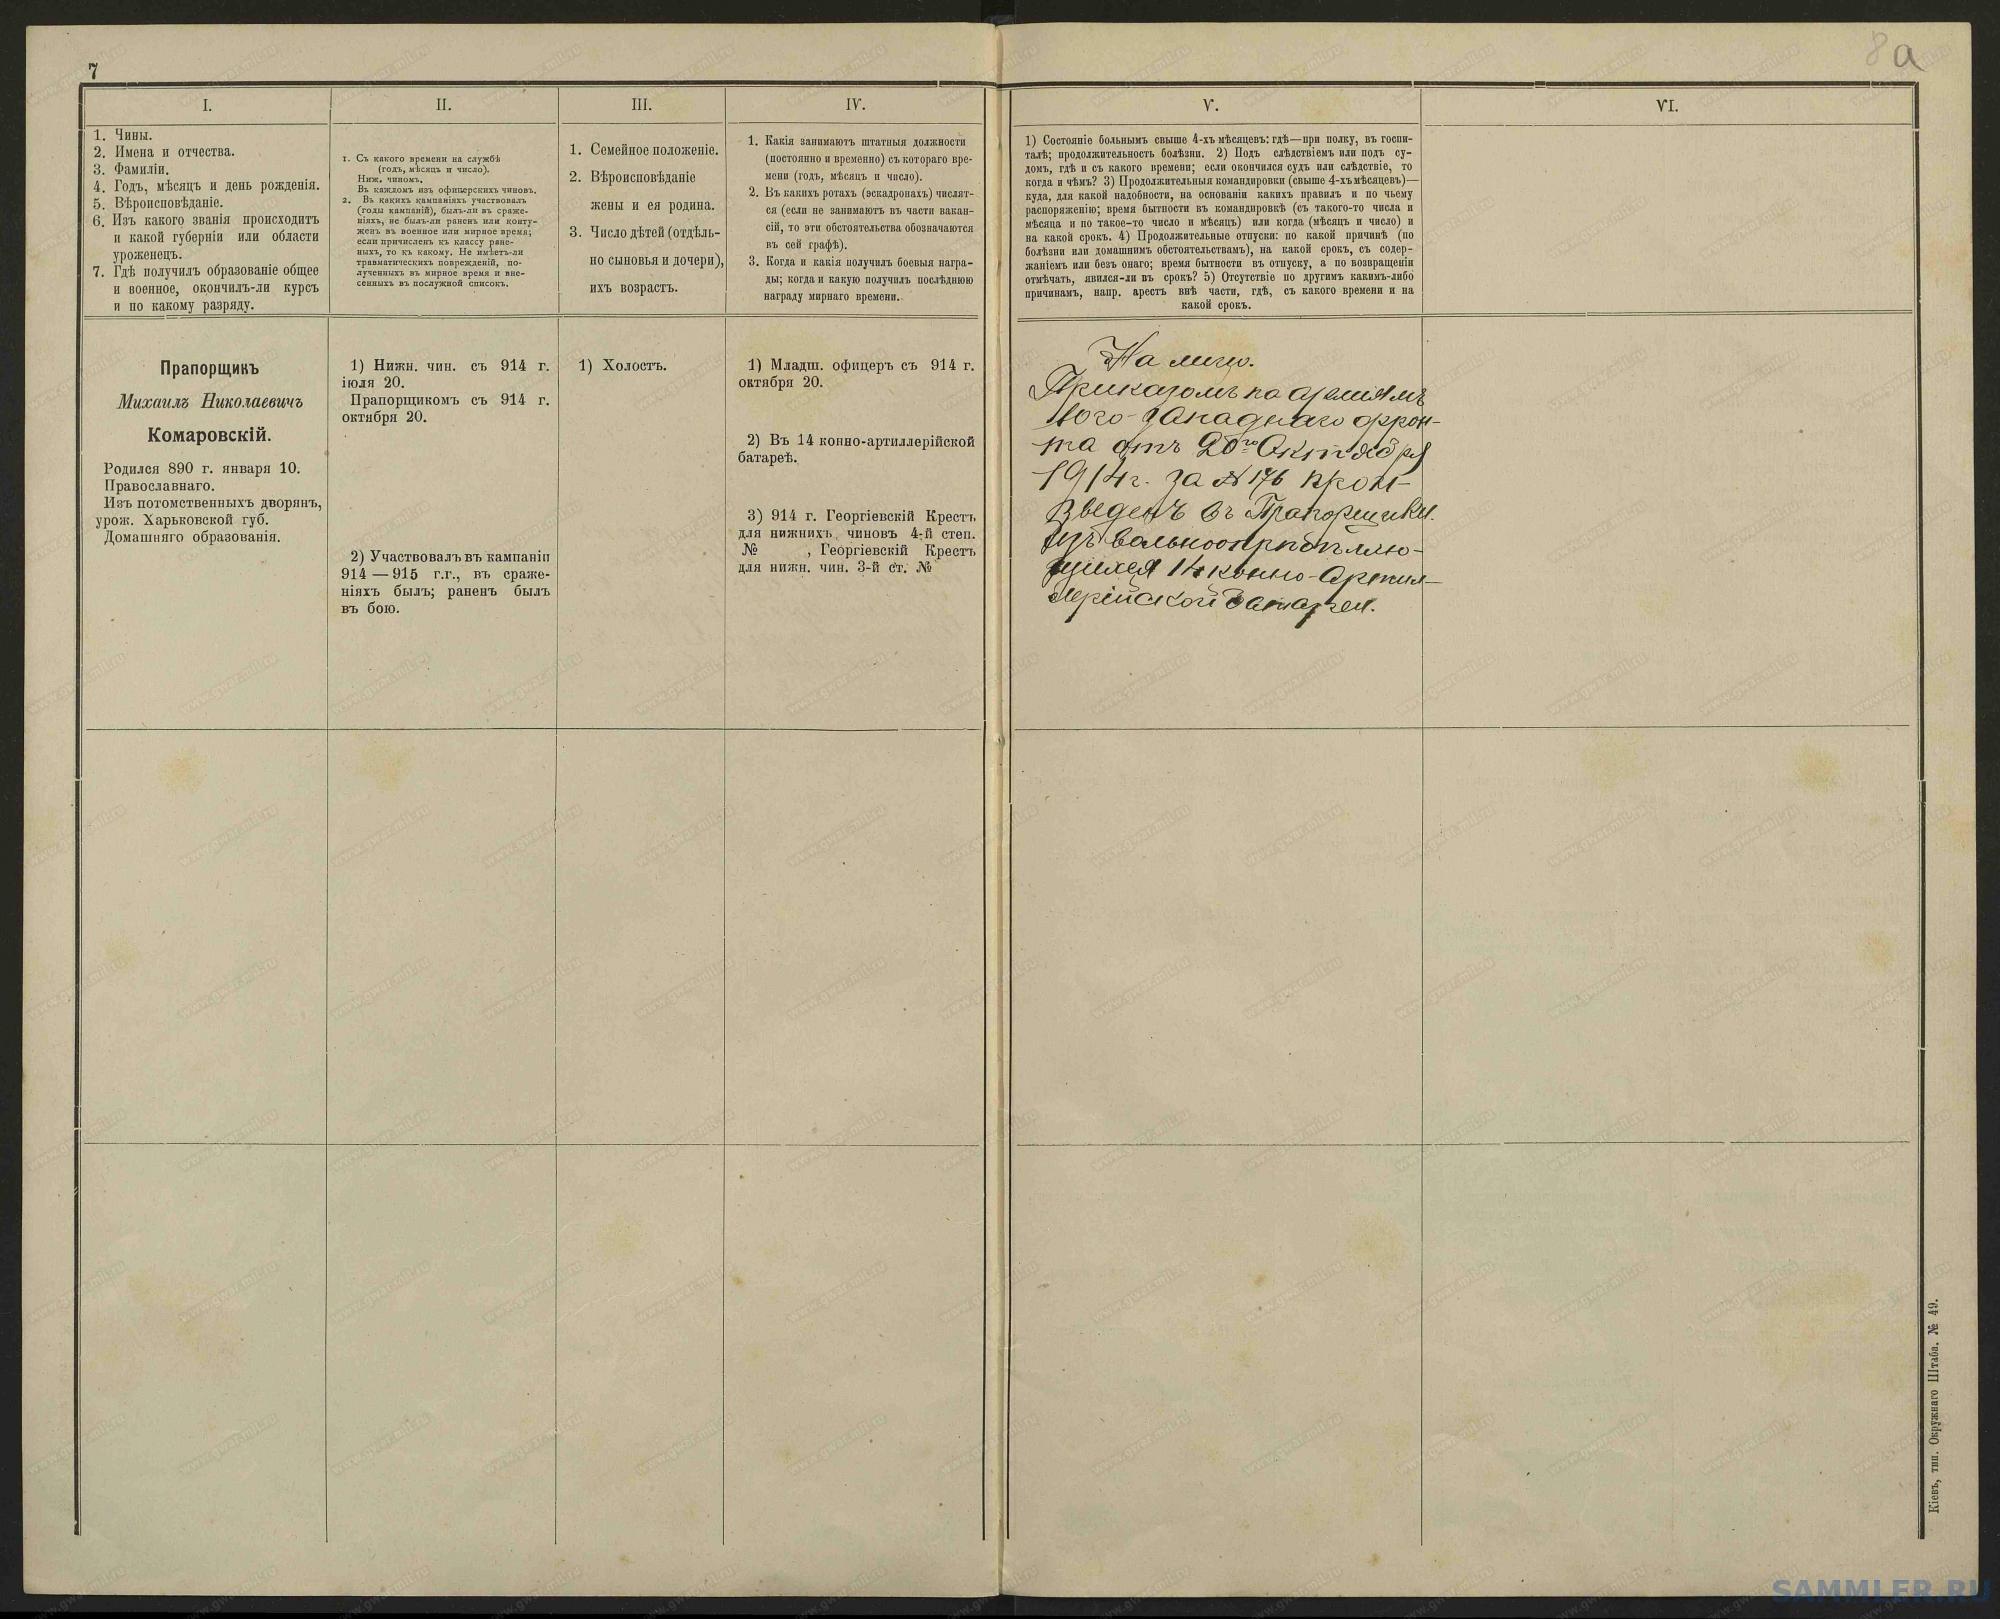 Список офицеров 7-го конно-артиллерийского дивизиона на 01.01.1915__11_.jpg